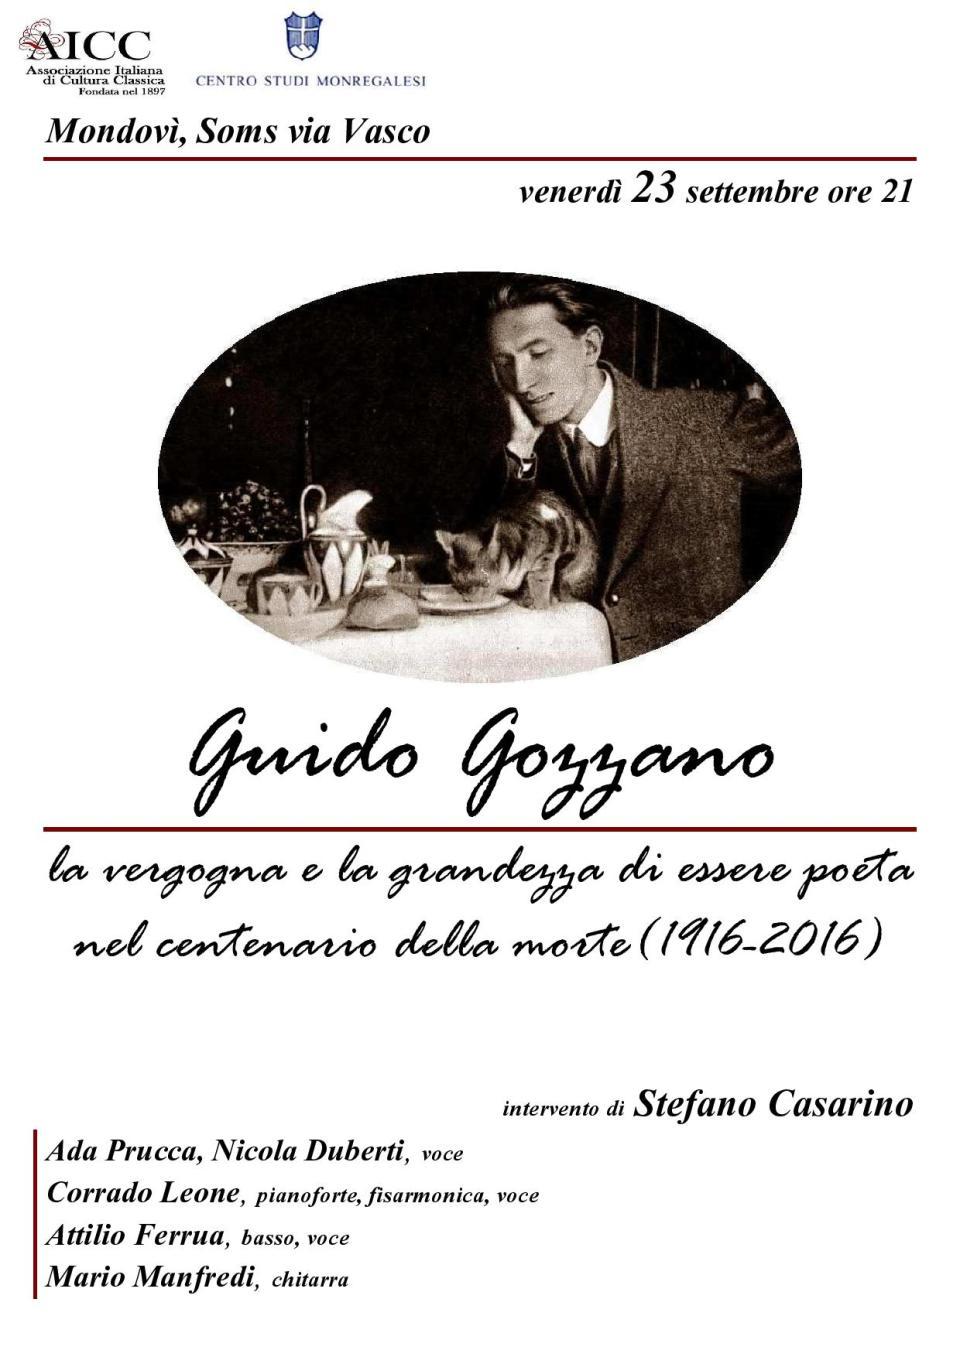 locandina-gozzano-soms-mondovi-23-09-2016-page-001